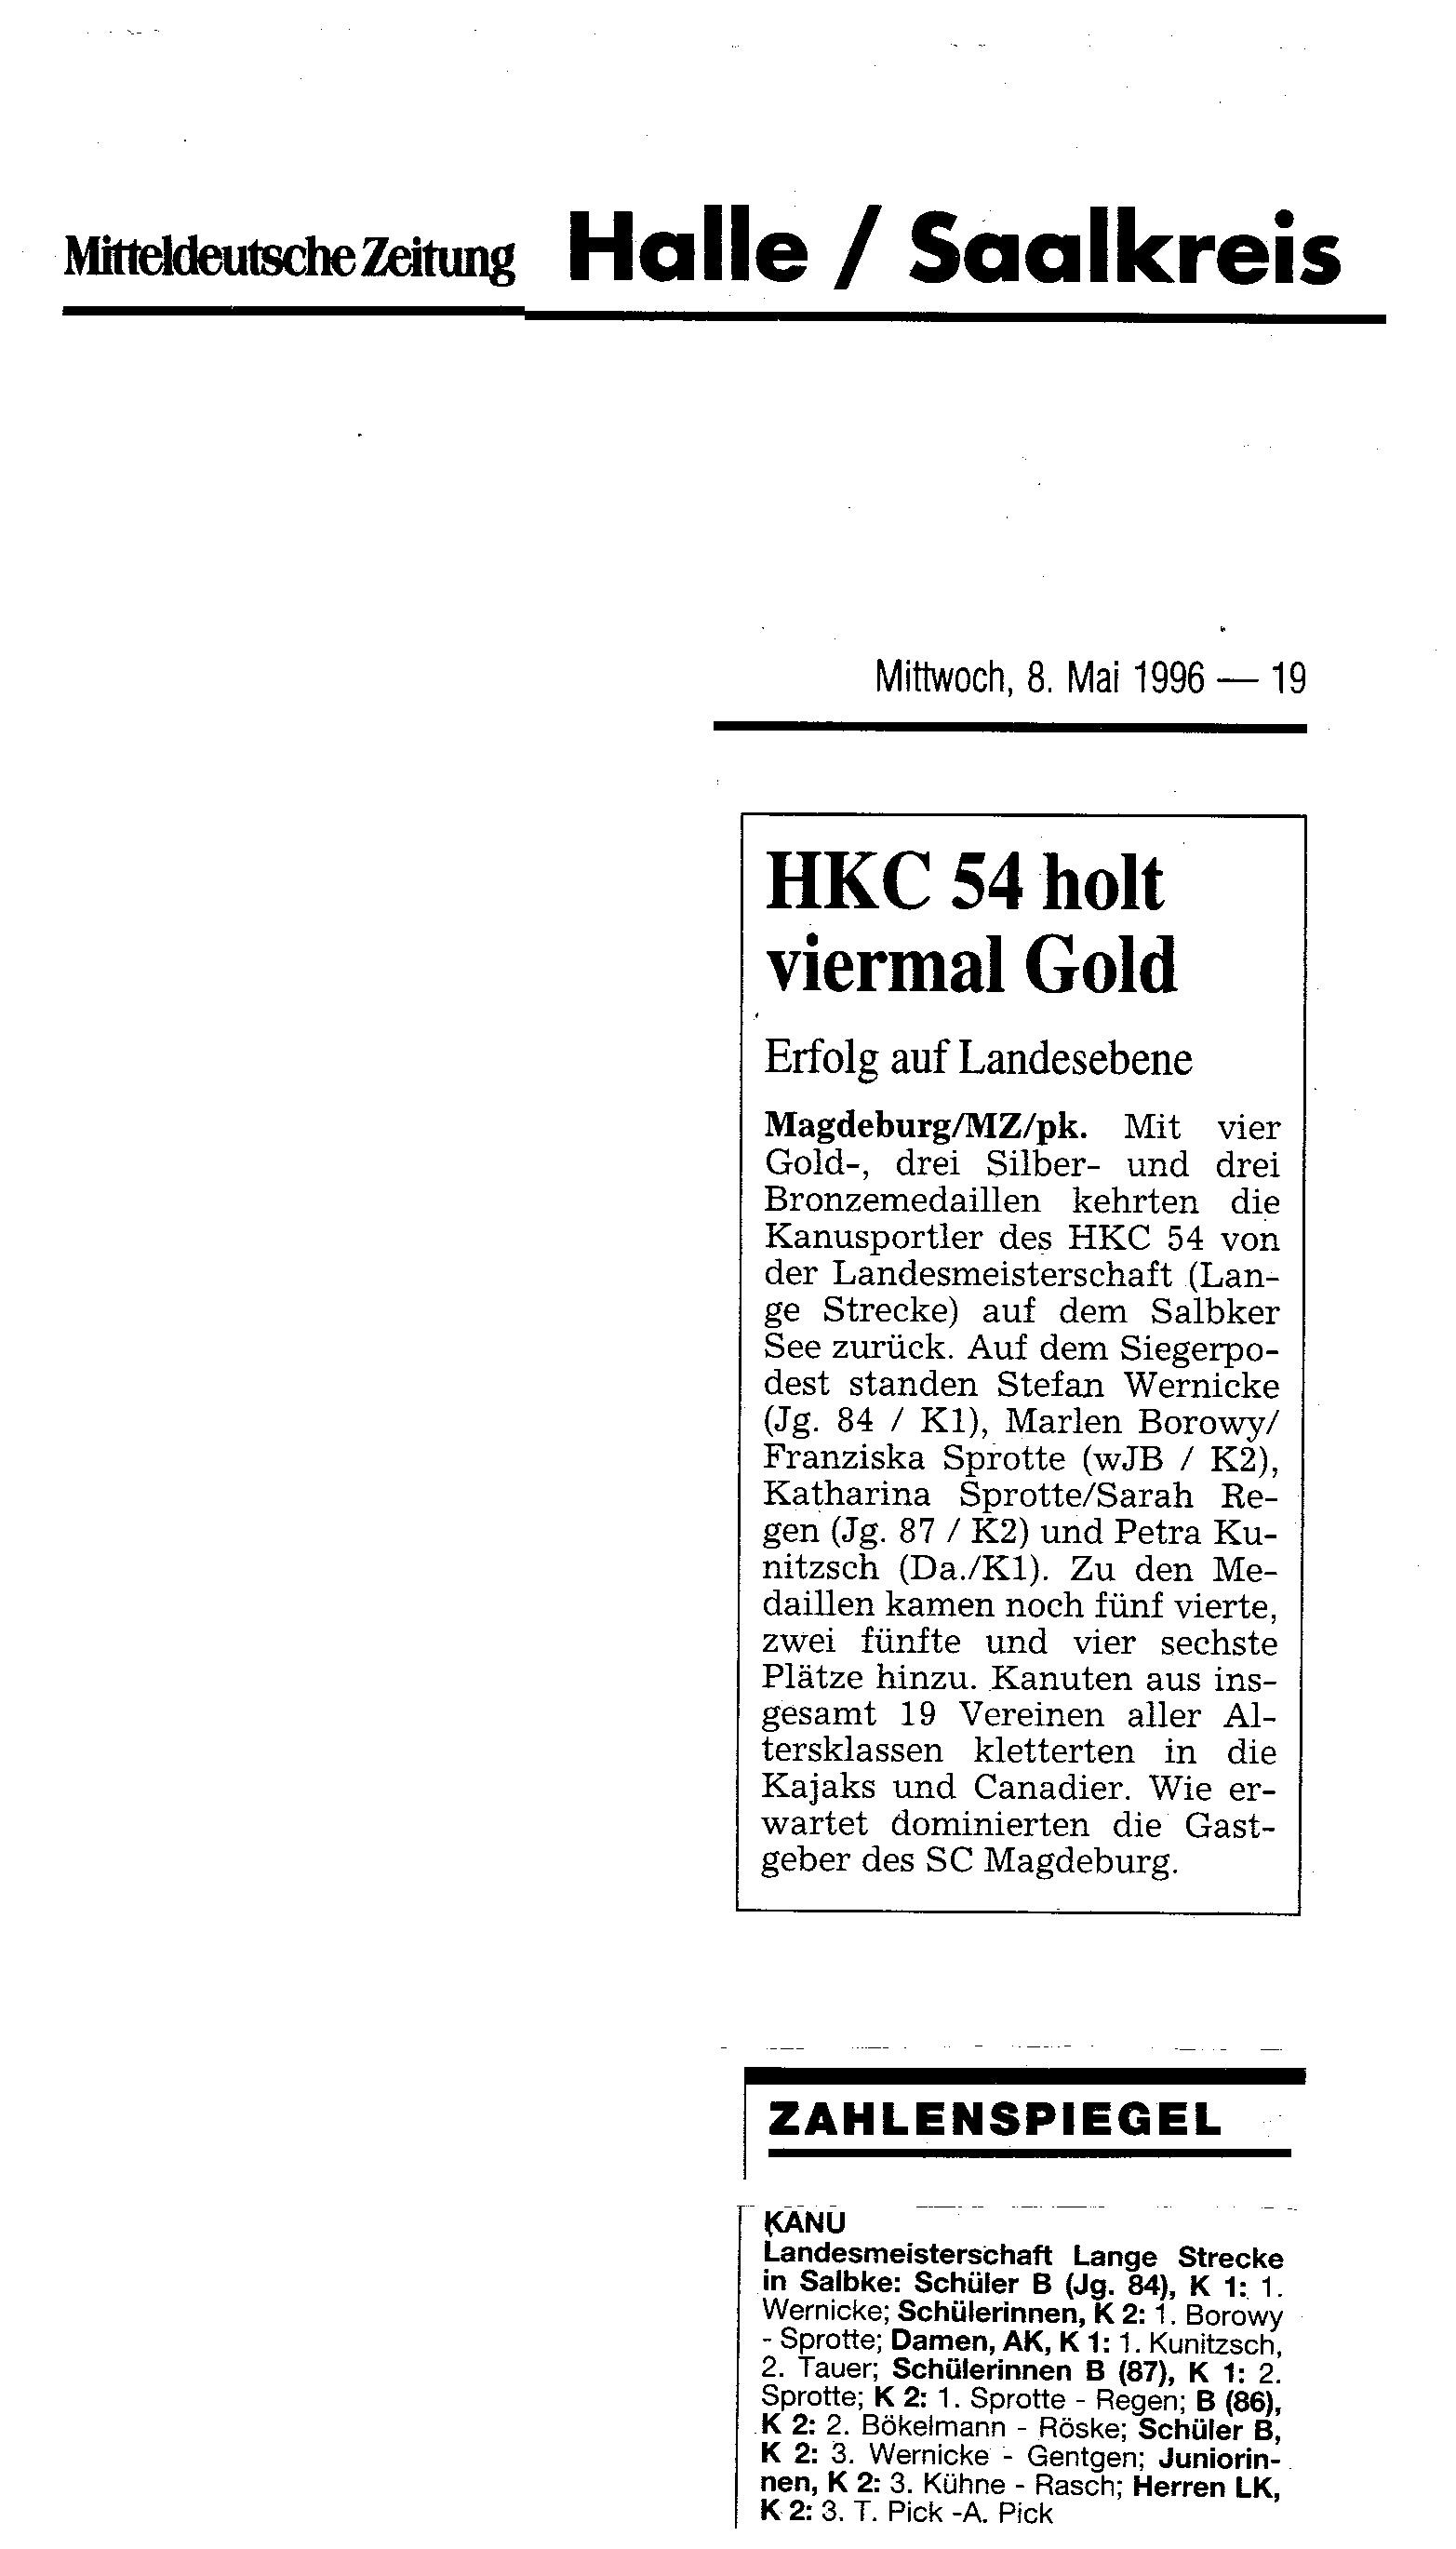 1996-05-08 MZ HKC 54 holt viermal Gold